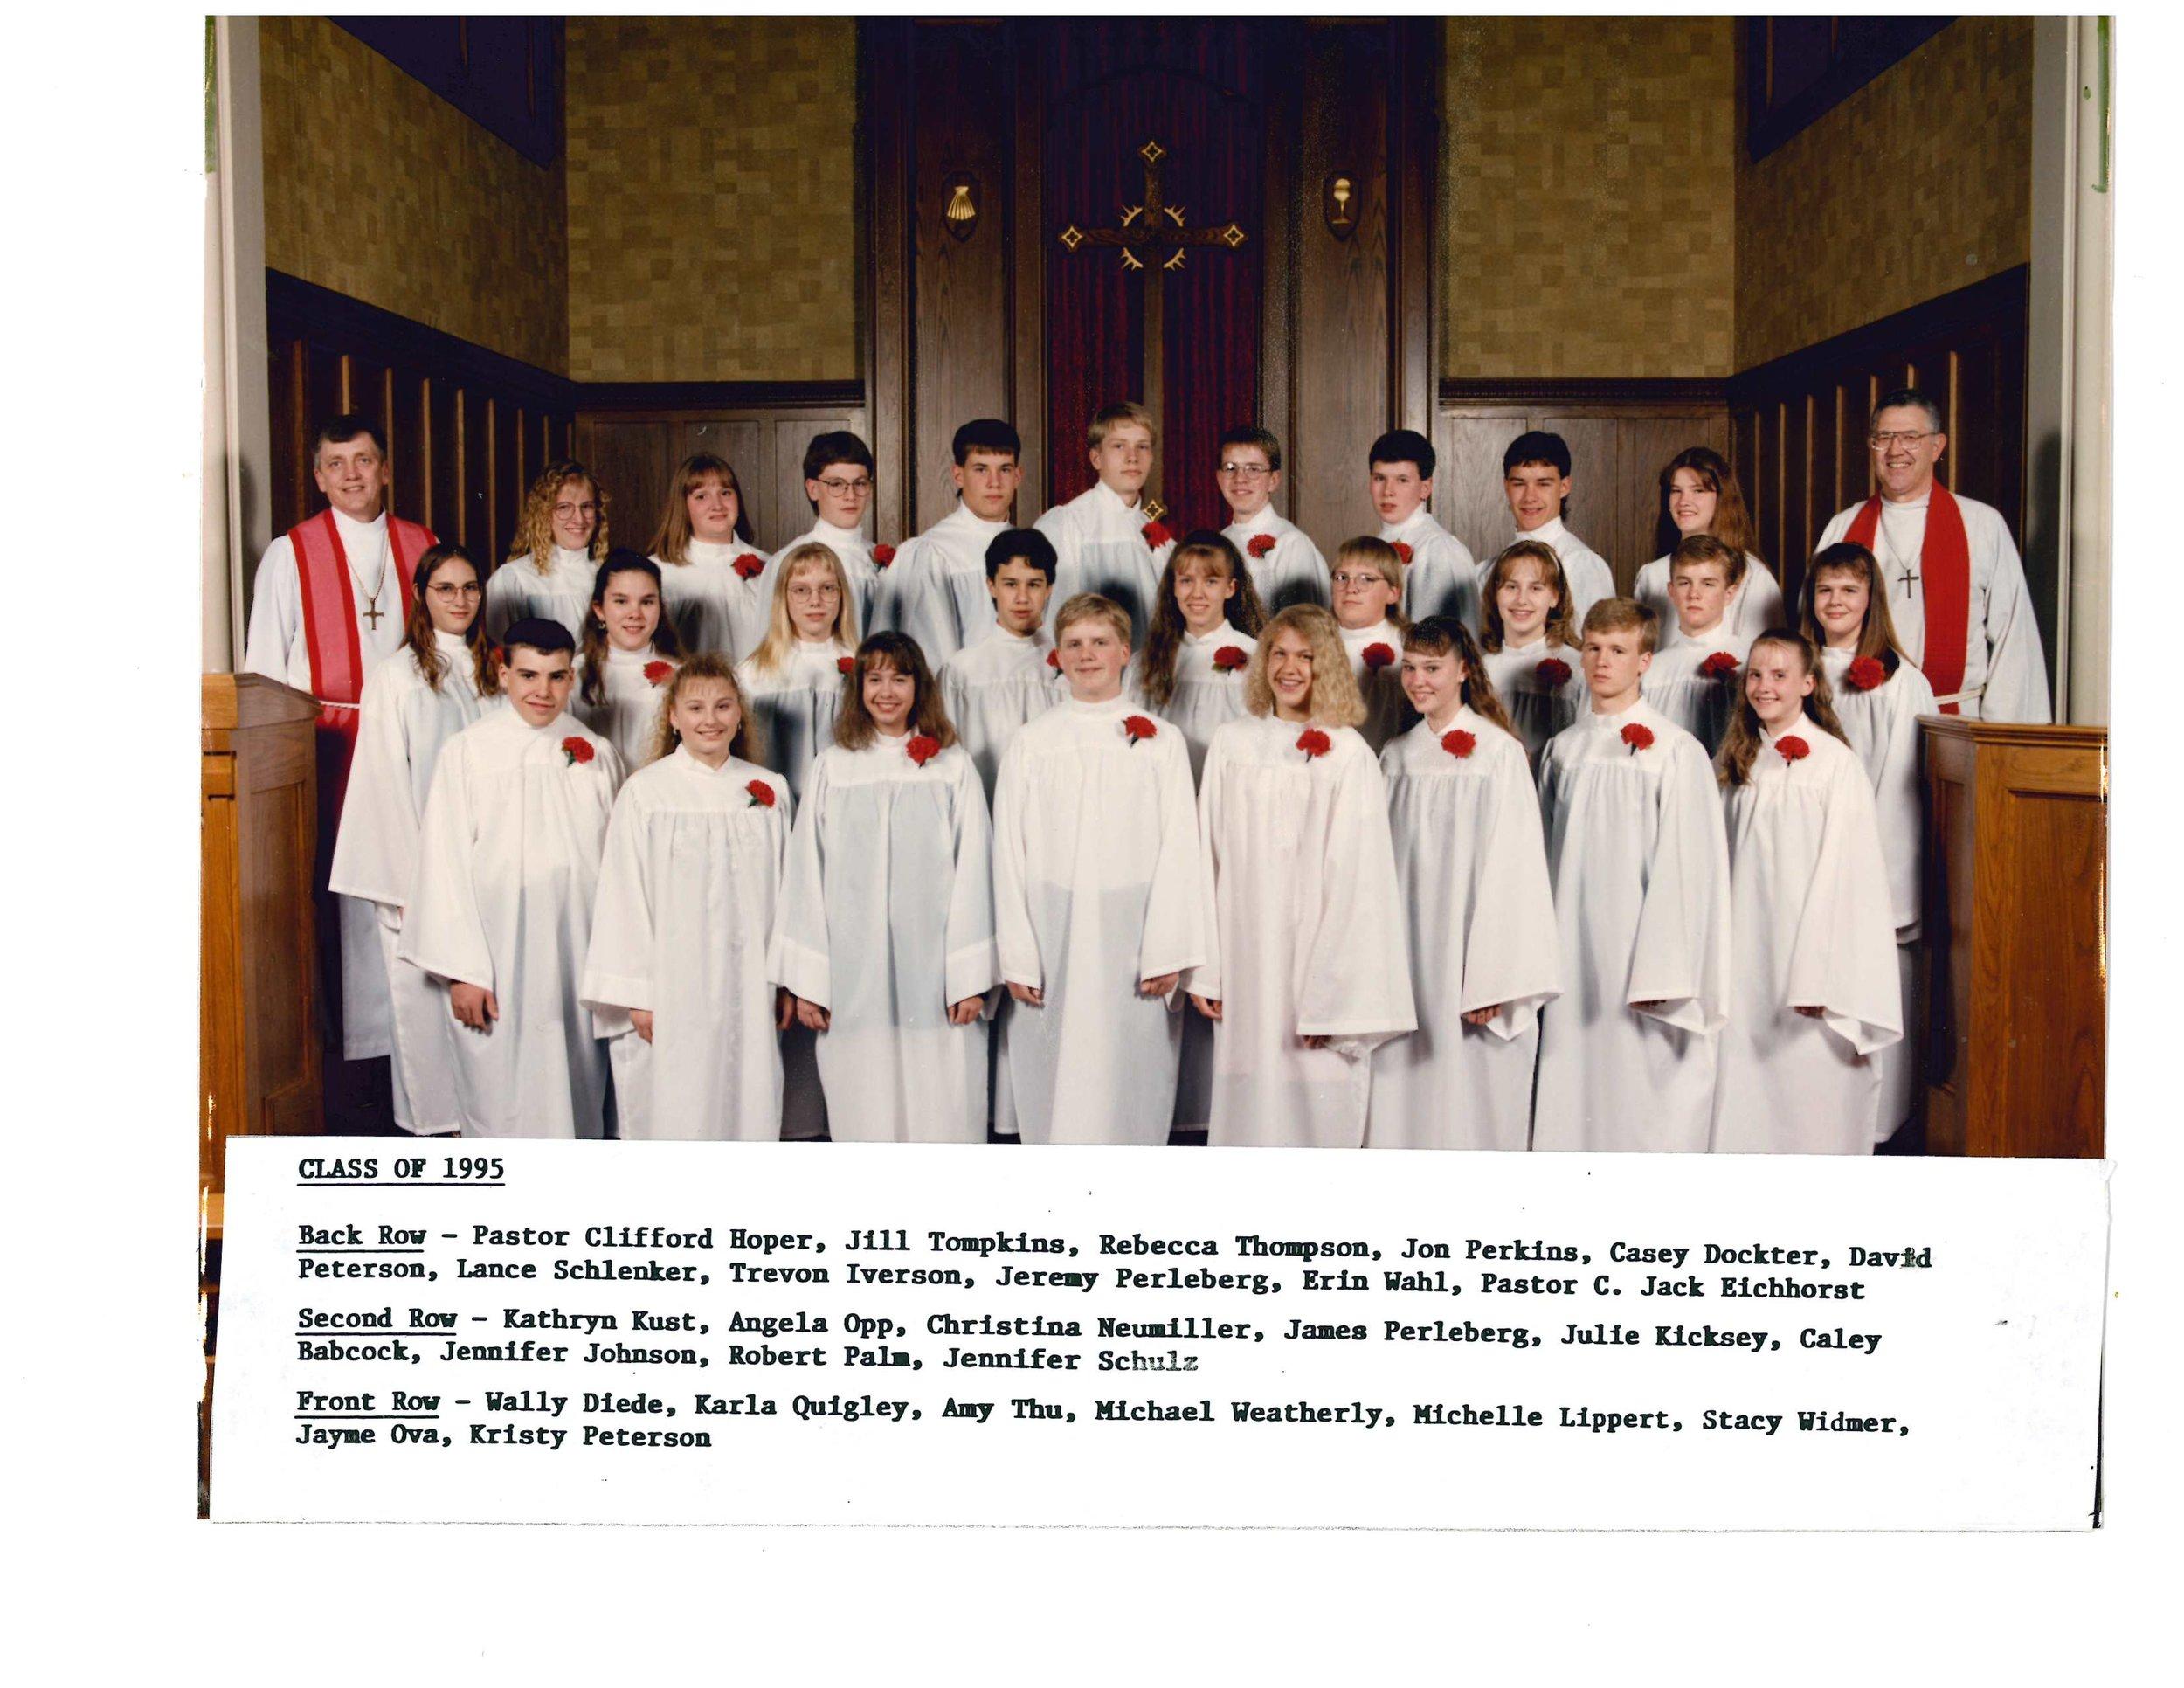 1995 confirmation photo.jpg